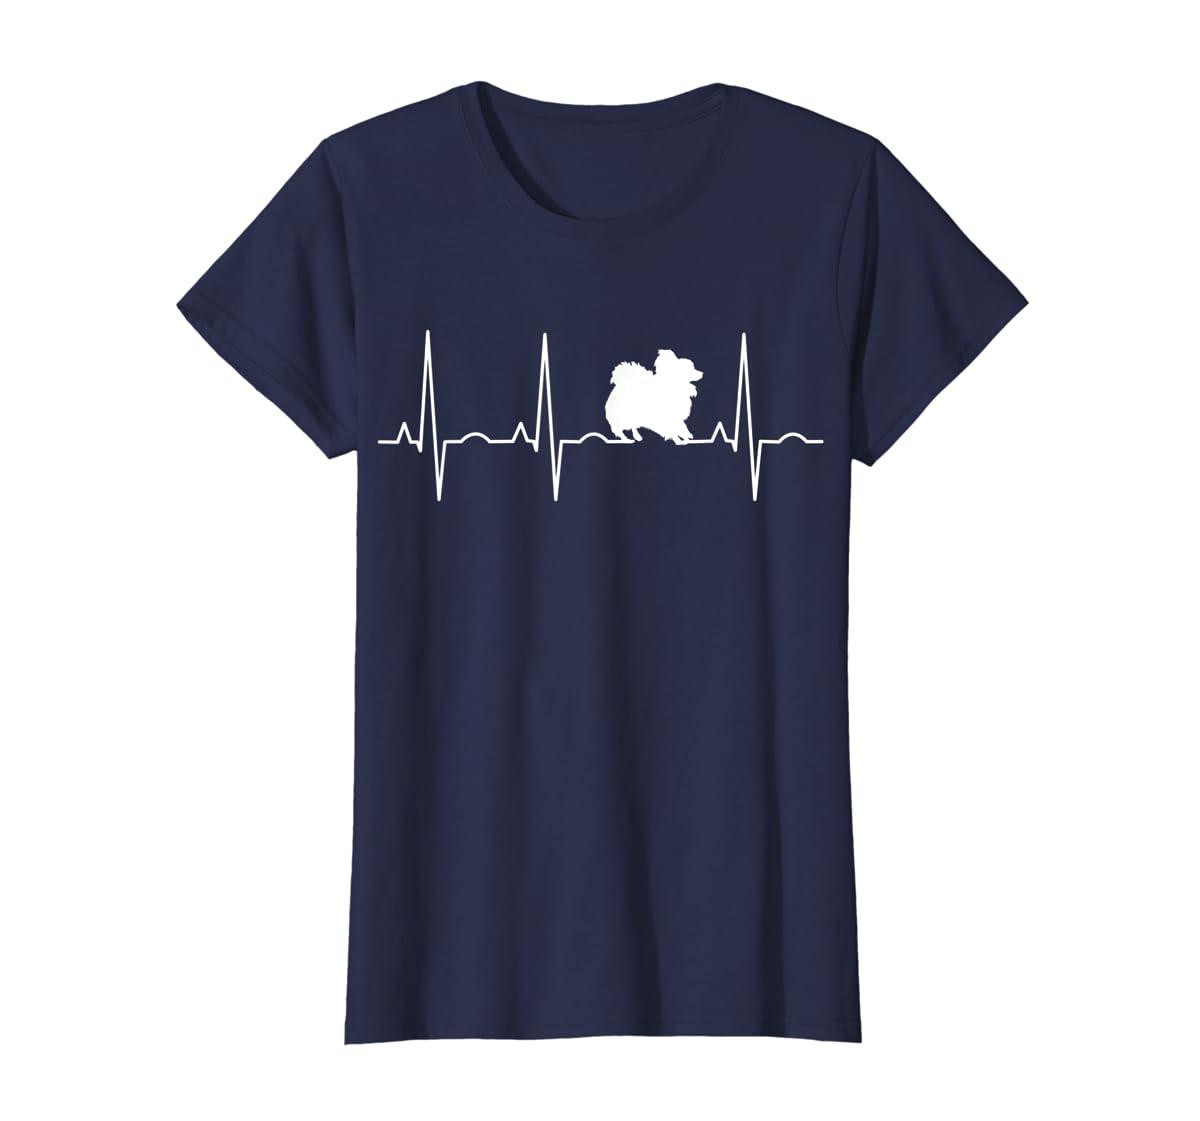 Pomeranian Heartbeat T-Shirt Pom Shirt Gifts Dog Lover-Women's T-Shirt-Navy